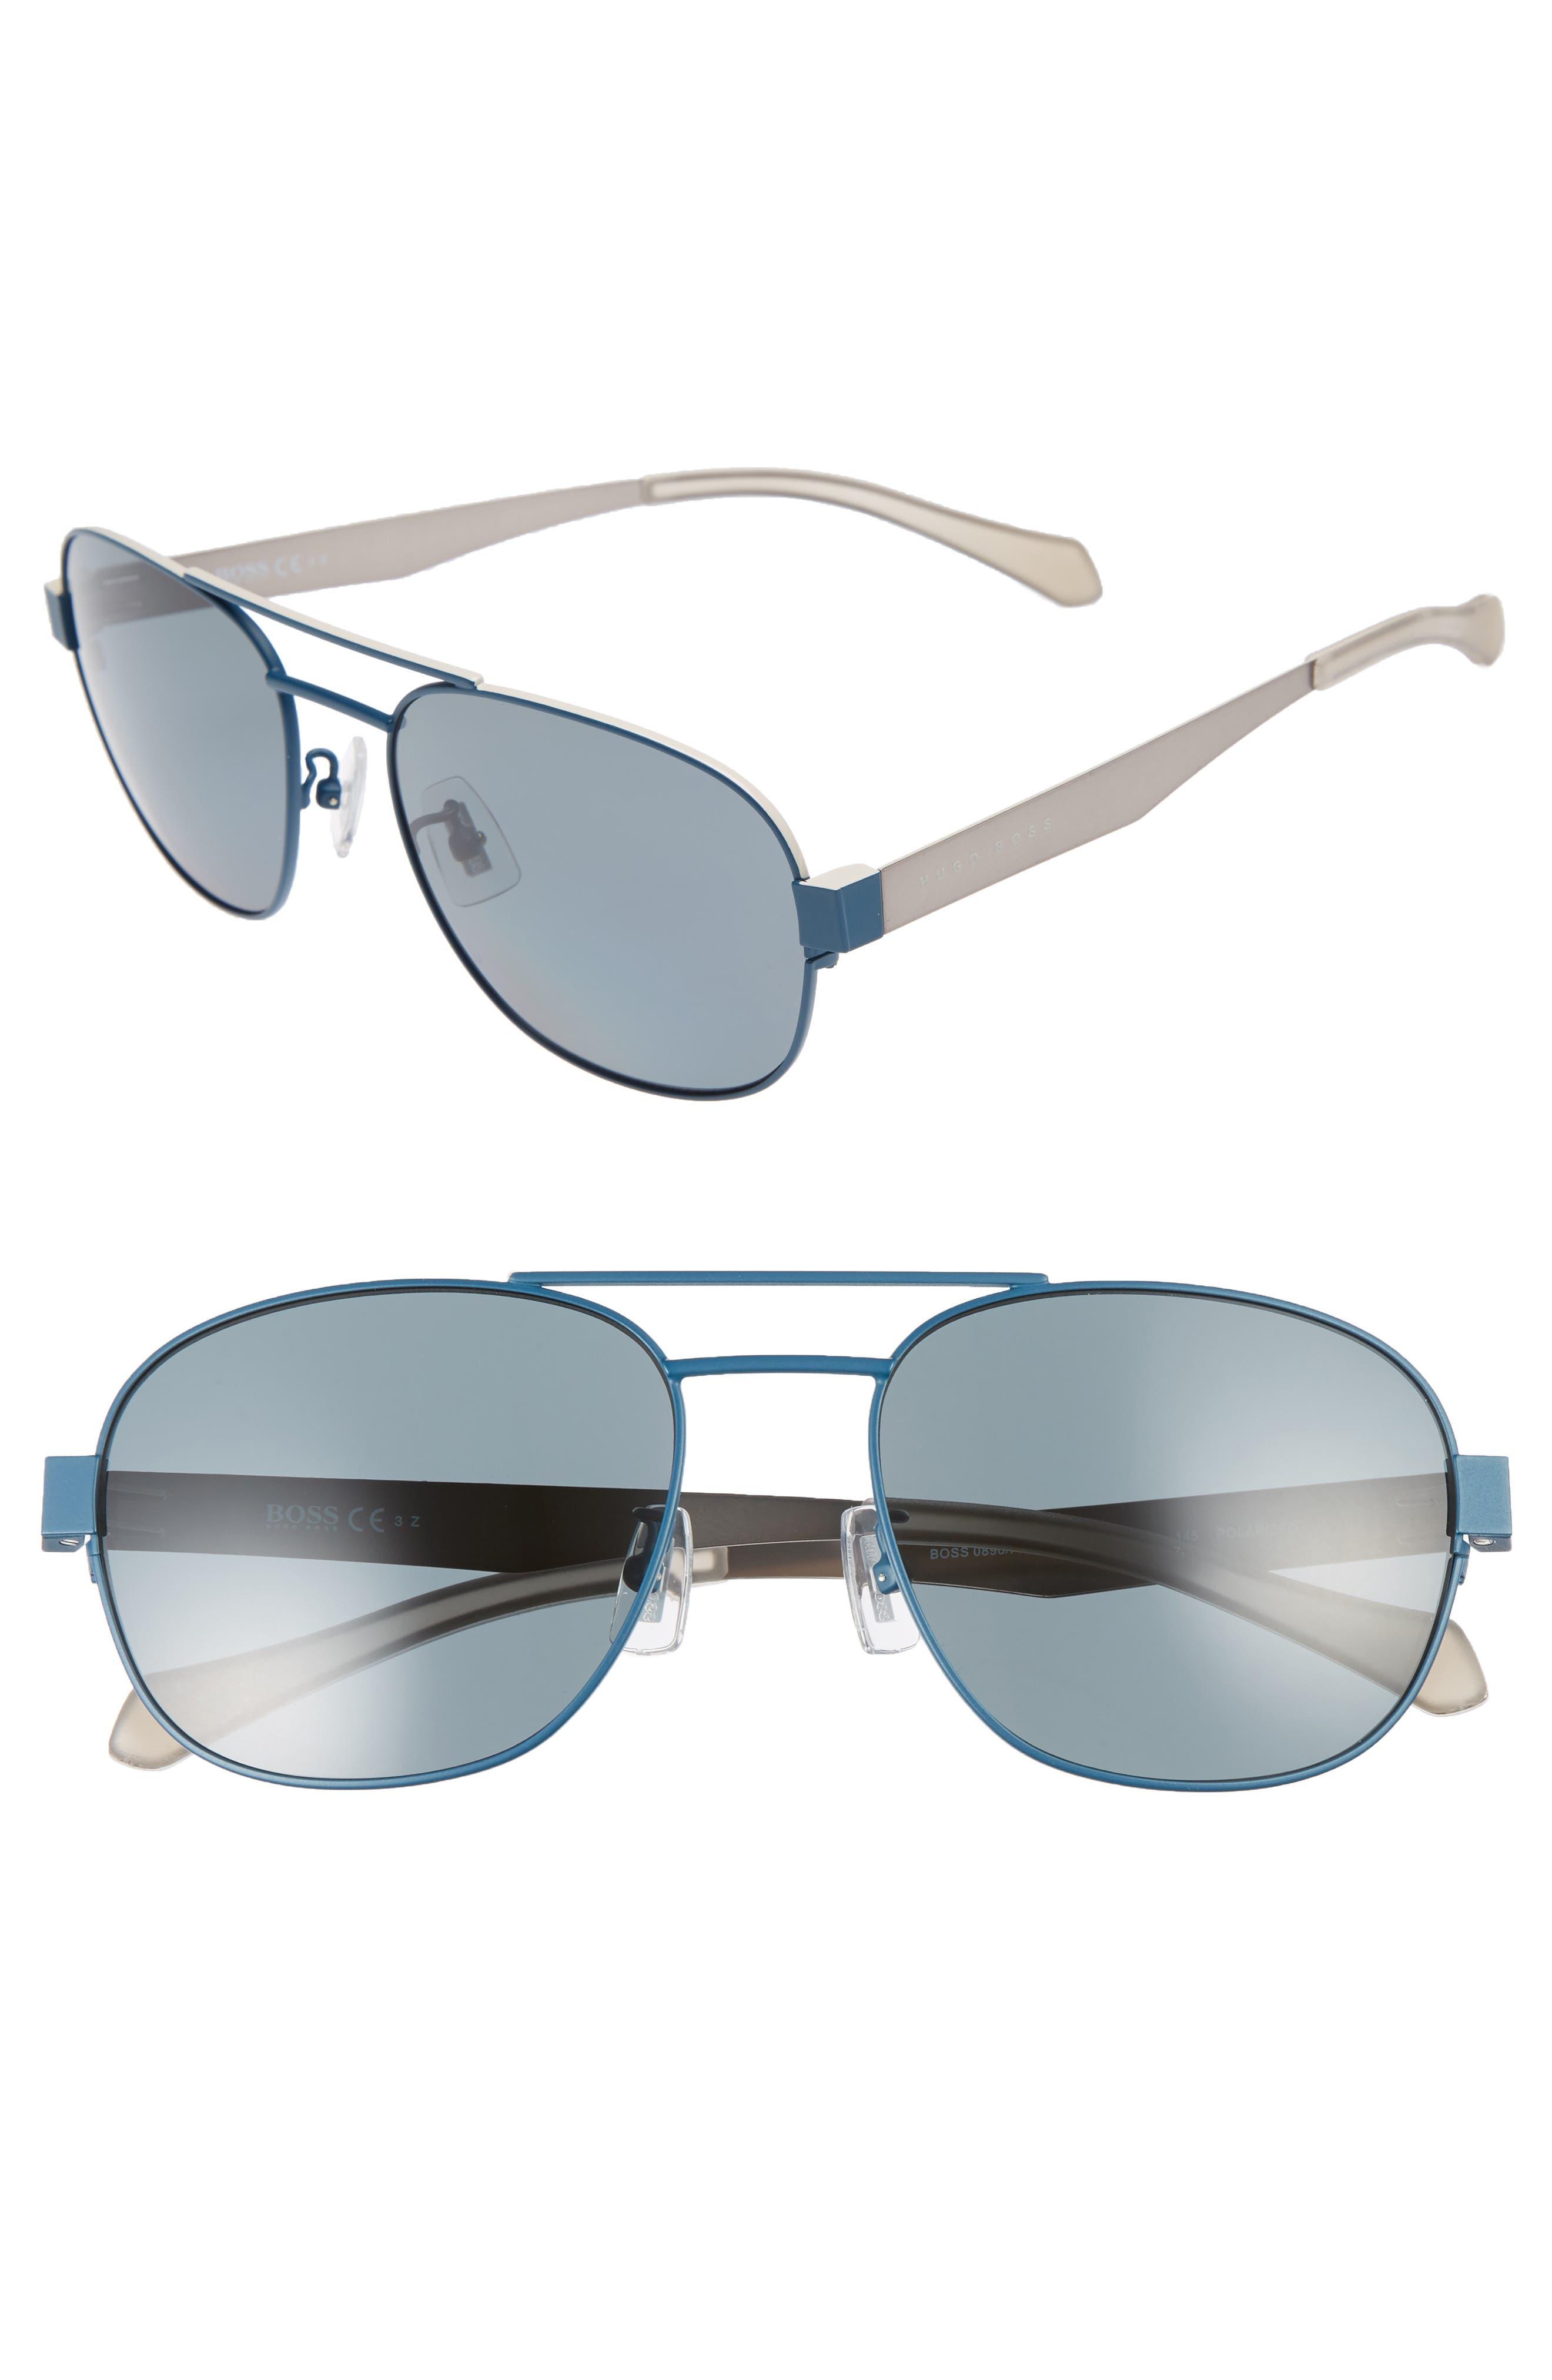 Main Image - BOSS 58mm Polarized Navigator Sunglasses